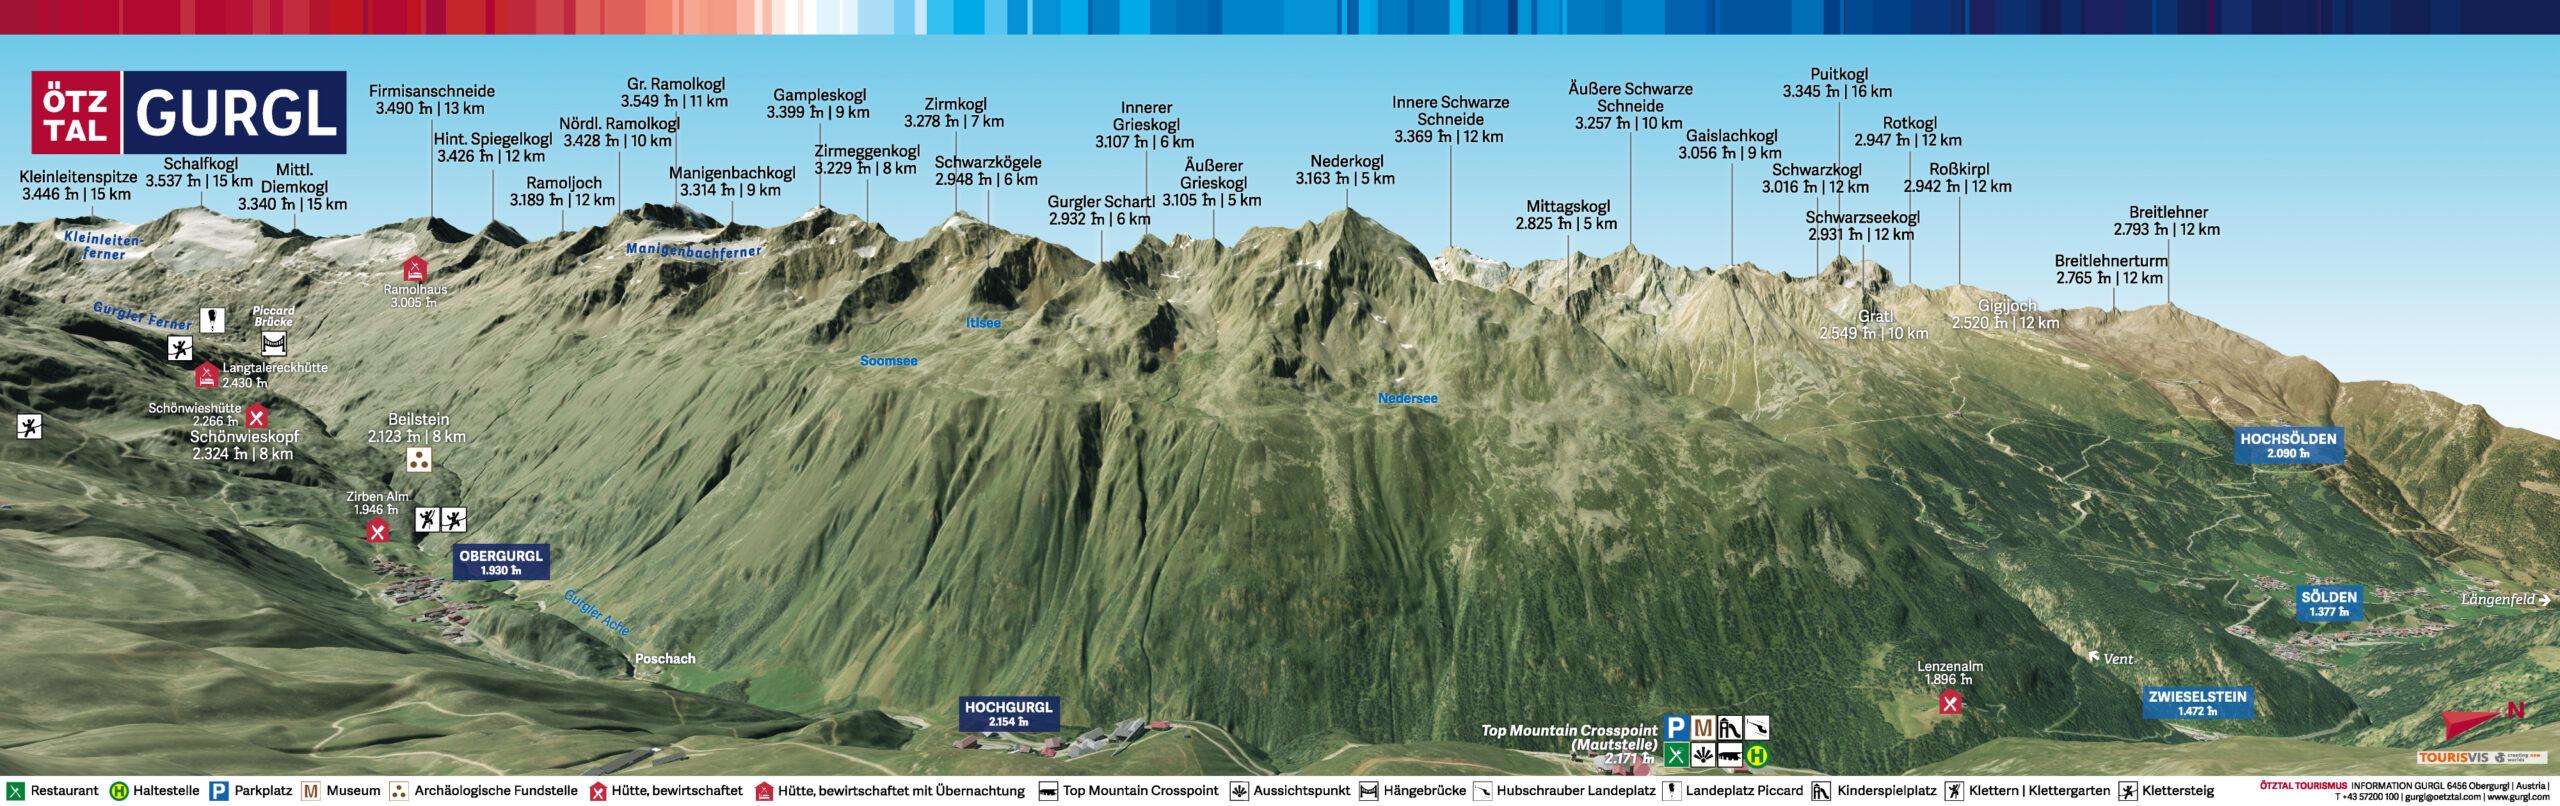 3D Gipfelpanorama - Bergstation Kirchenkar Gurgl Ötztal